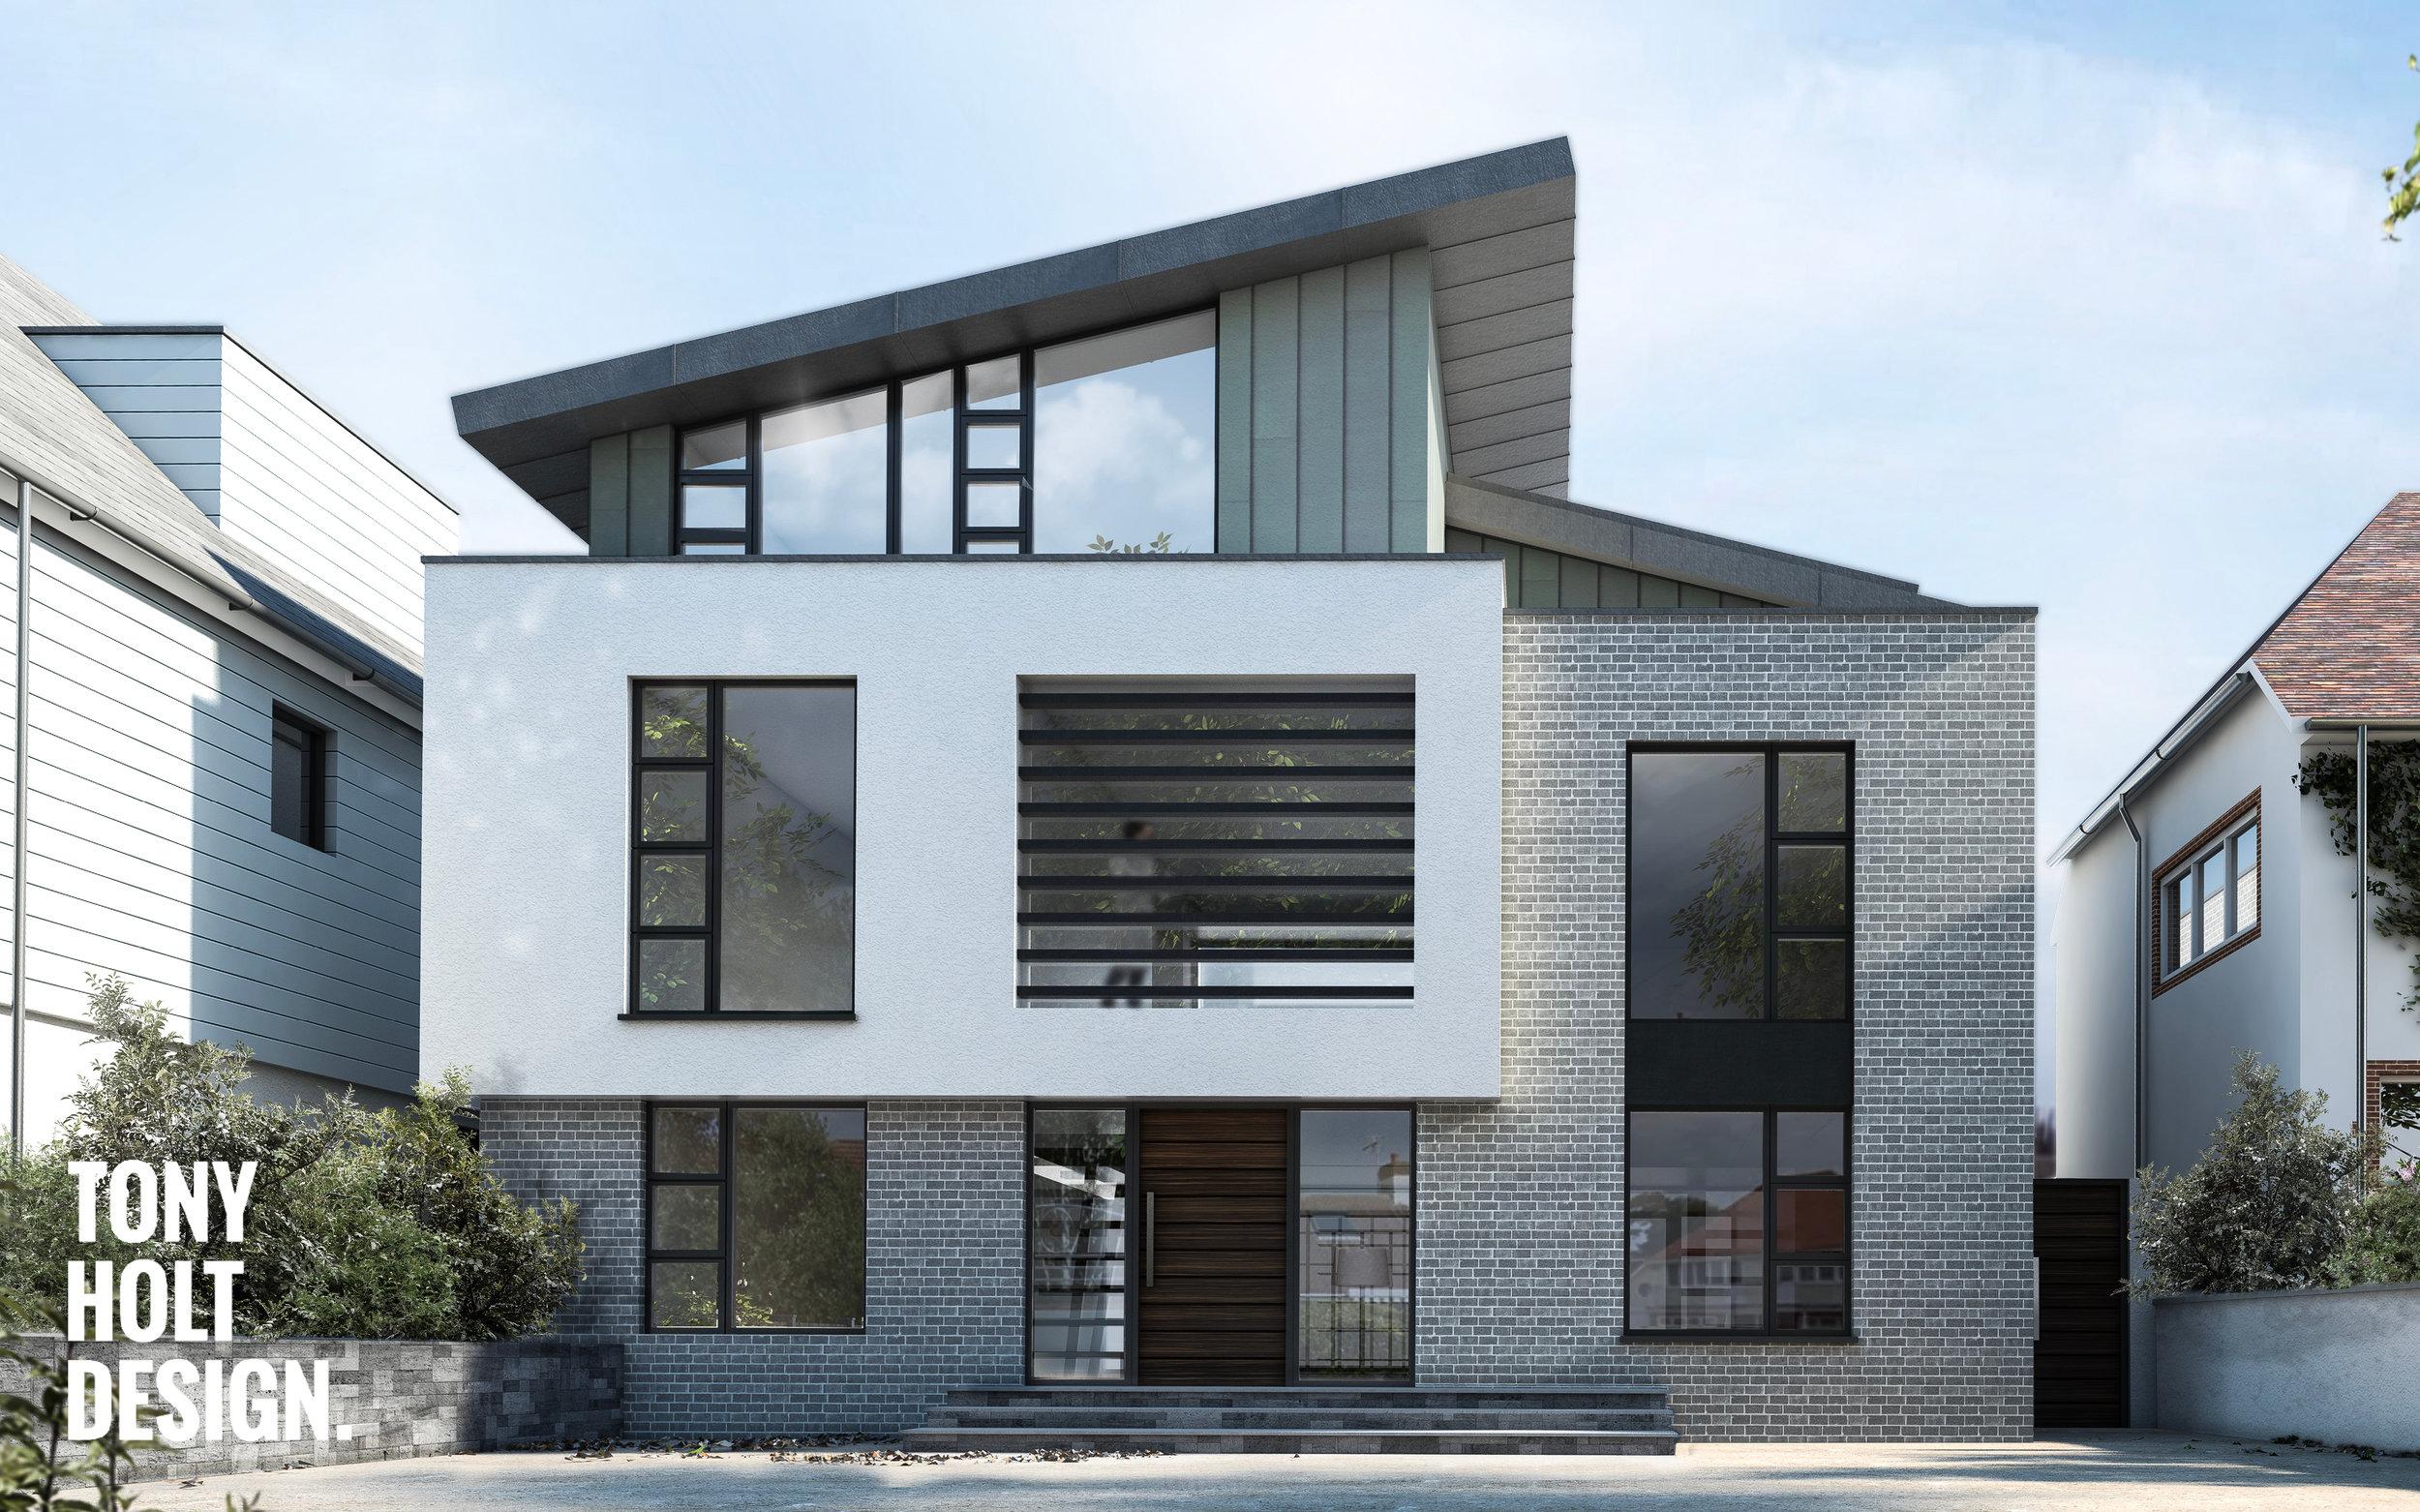 Tony_Holt_Design_Orchard_Avenue_New_Build_01.jpg